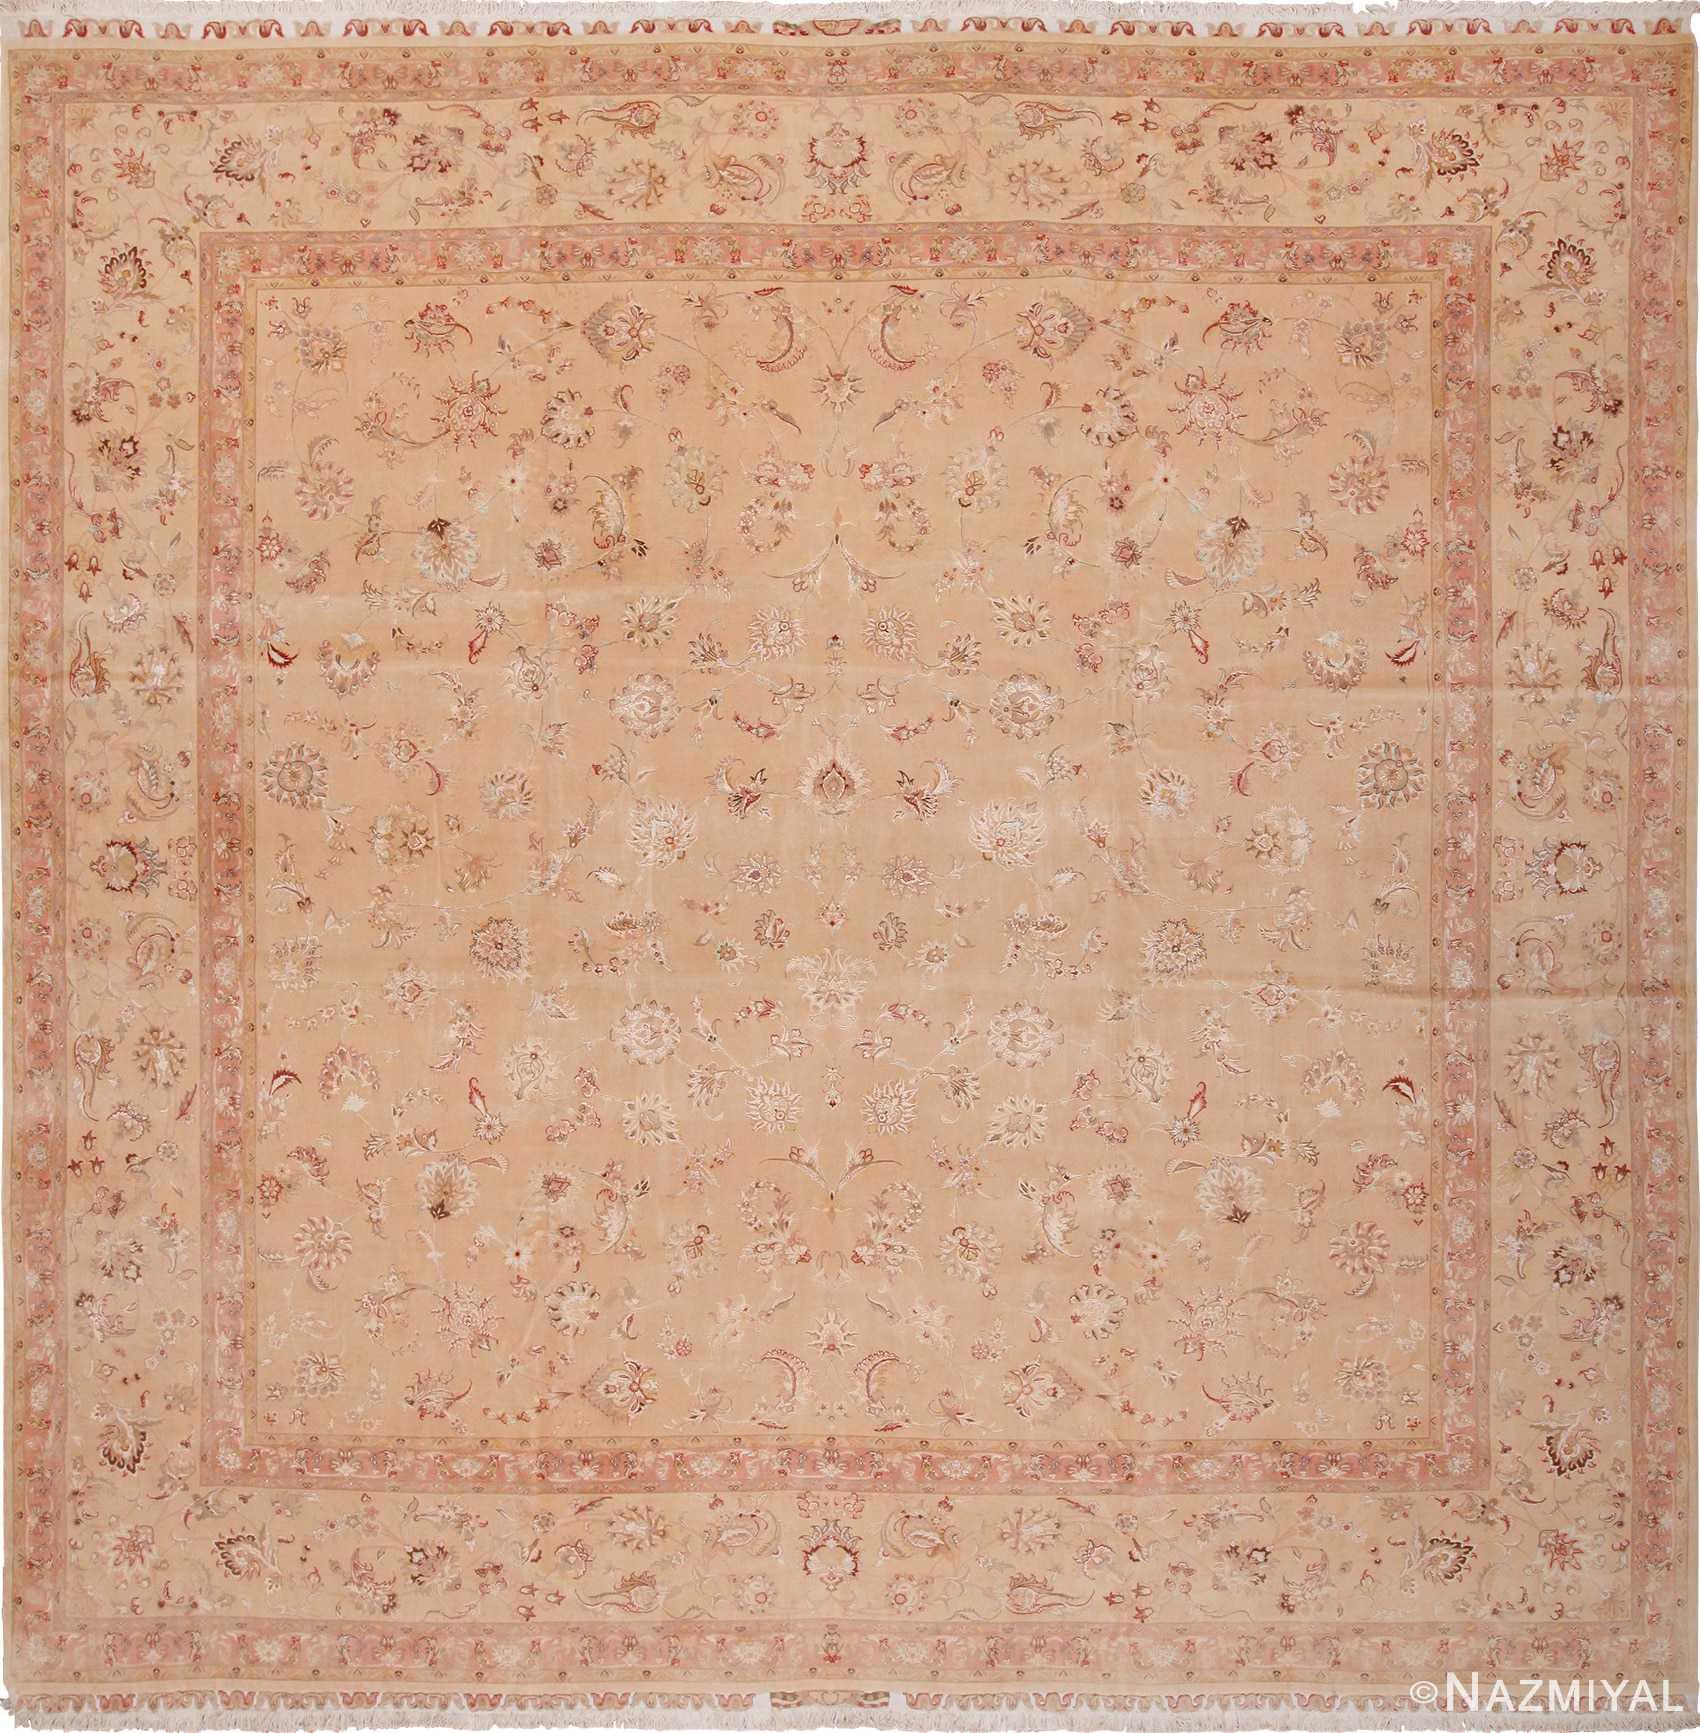 Modern Persian Tabriz Design Rug 44687 Nazmiyal Antique Rugs: Square Vintage Silk And Wool Persian Tabriz Rug 60026 Nazmiyal